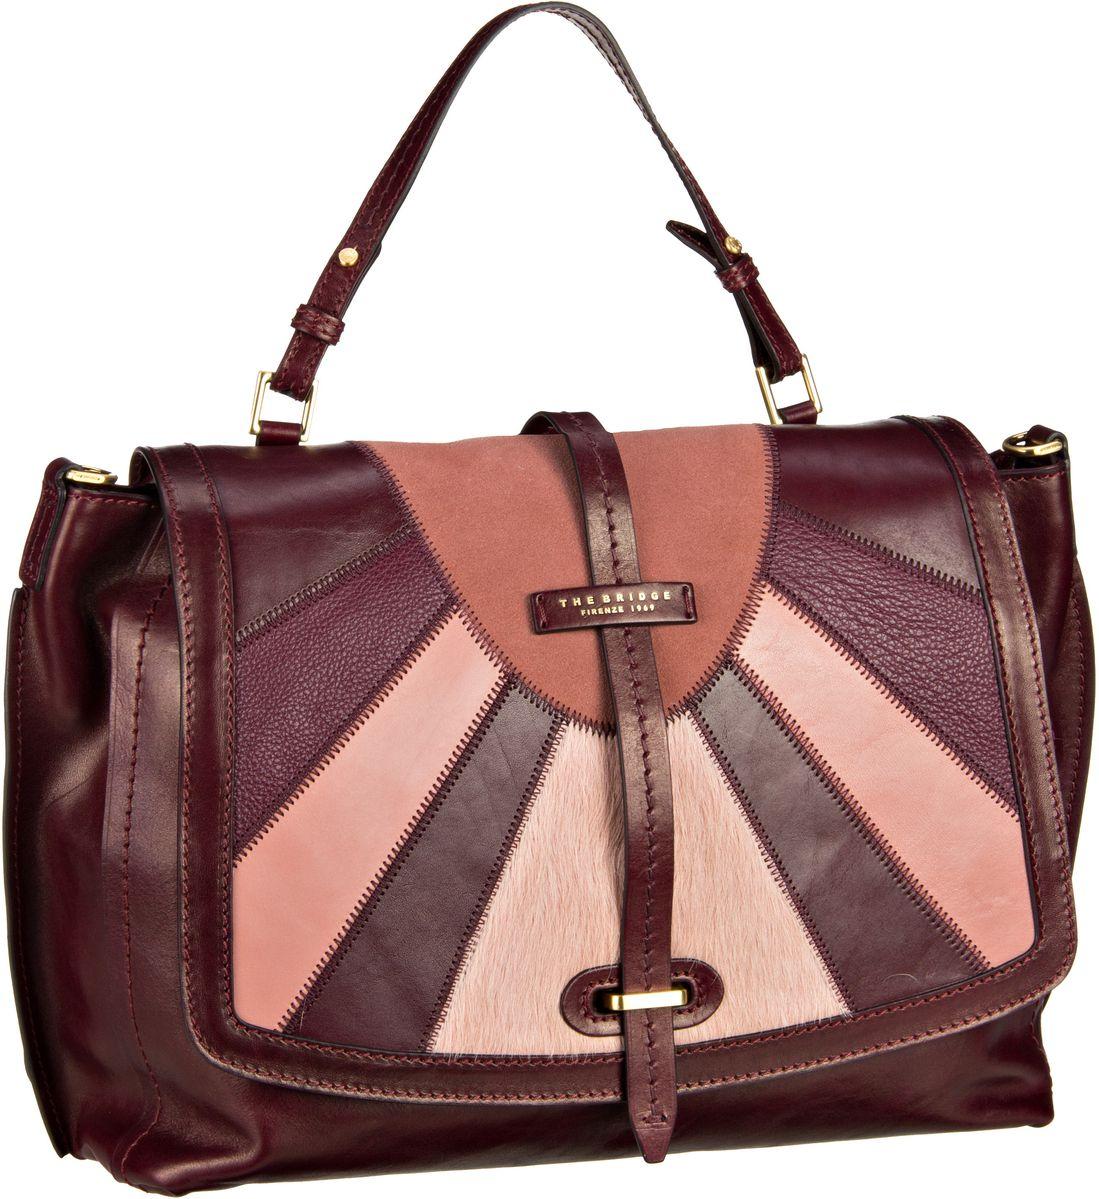 Handtasche Barga Handtasche 1327 Rosso Rubino/Oro